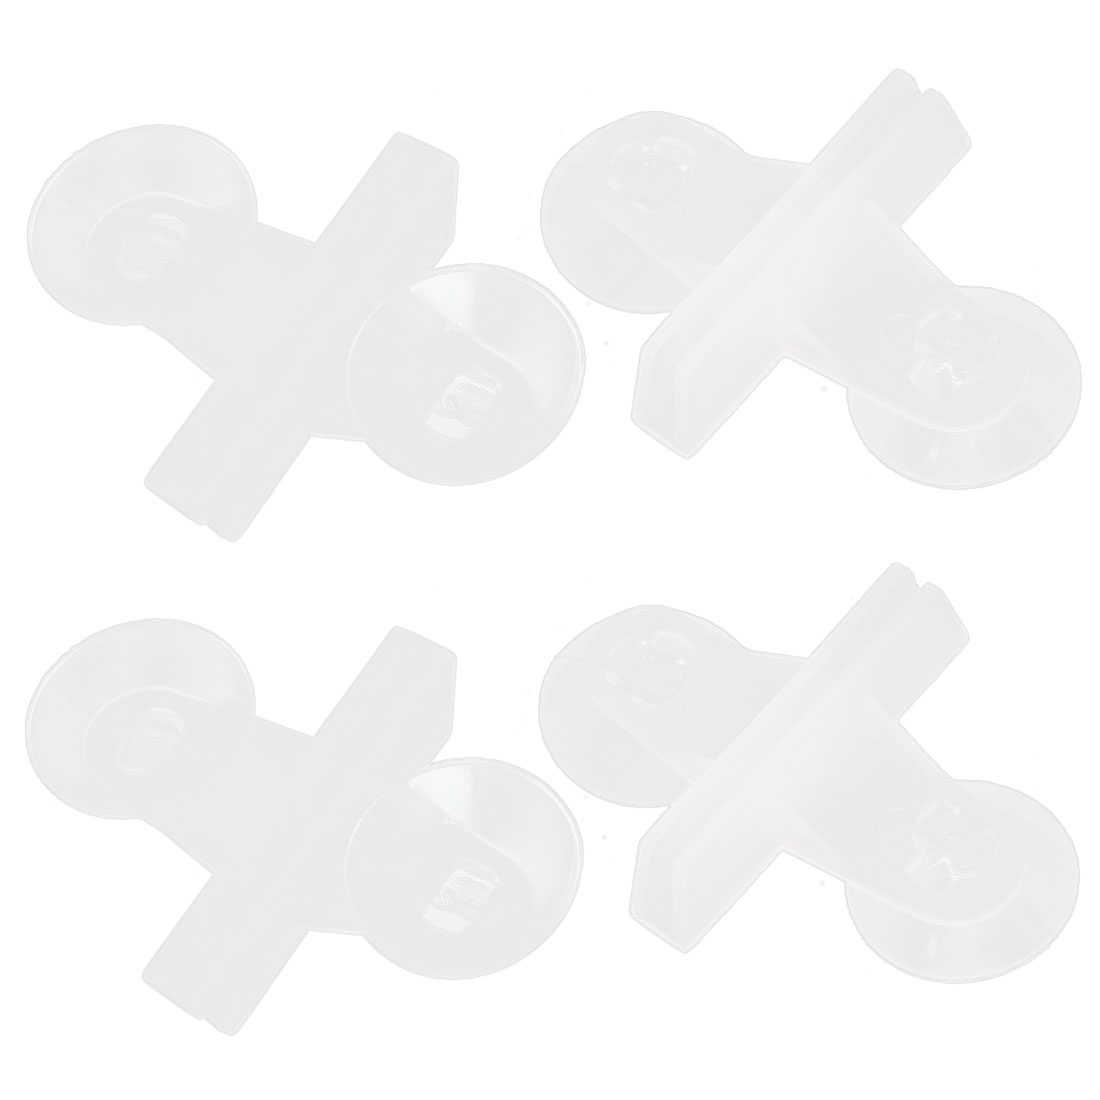 Aquarium Fish Tank Plastic Glass Suction Cup Divider Sheet Holder Clip White 4pcs